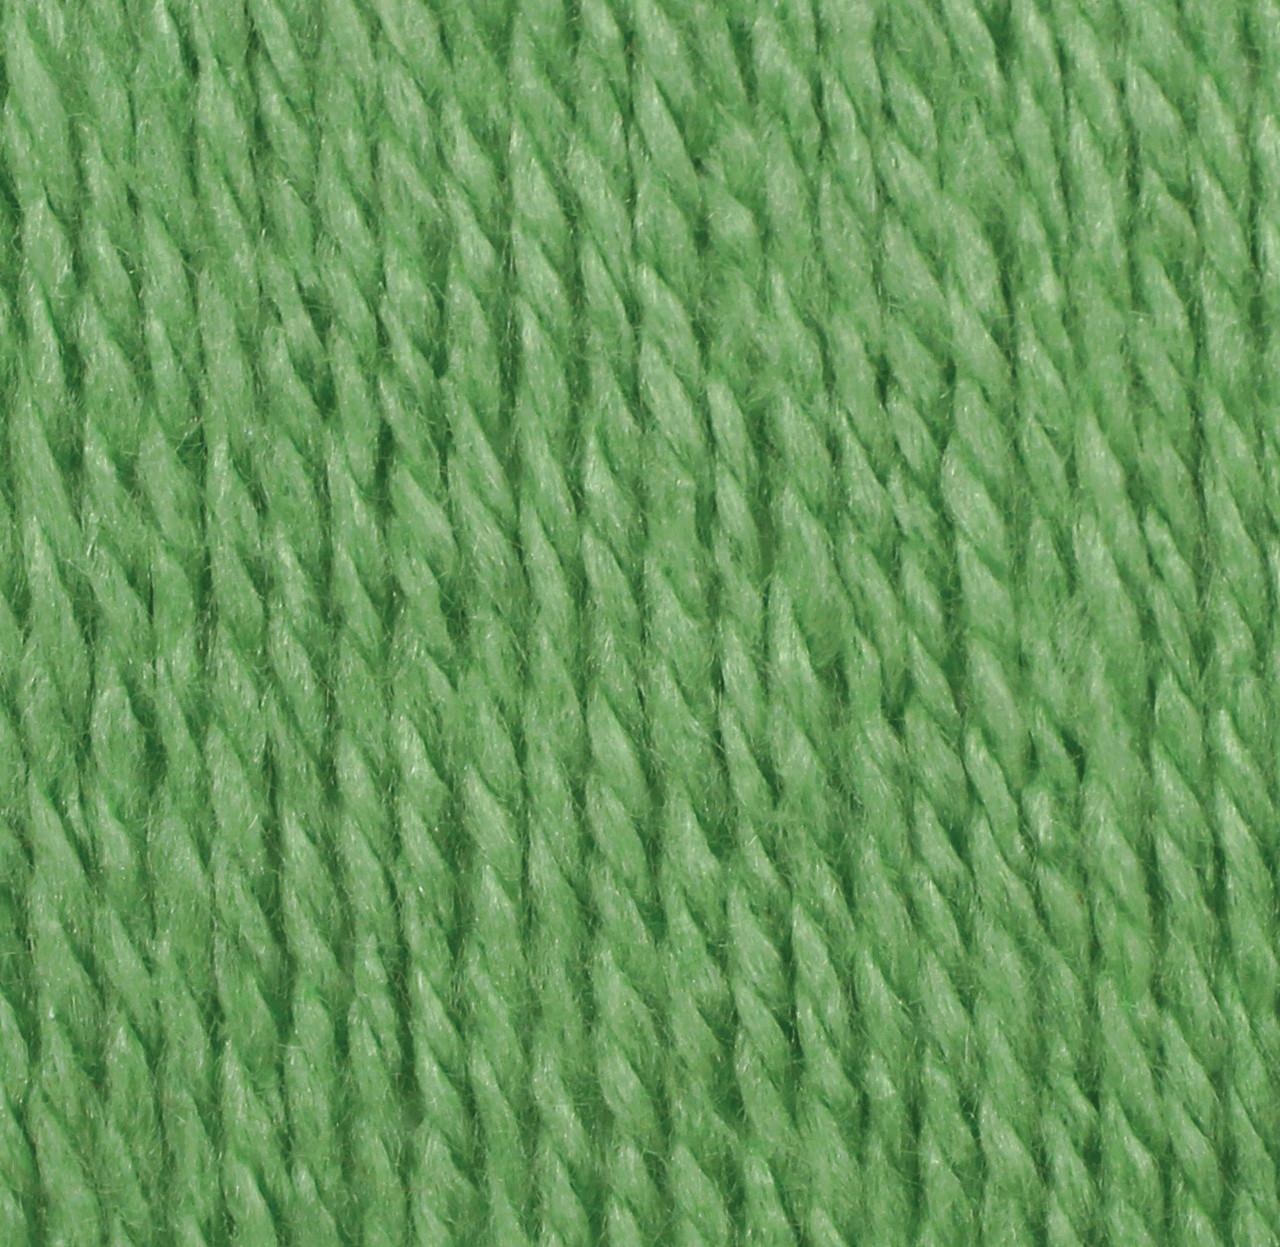 Bernat Softee Baby Green Grass Yarn